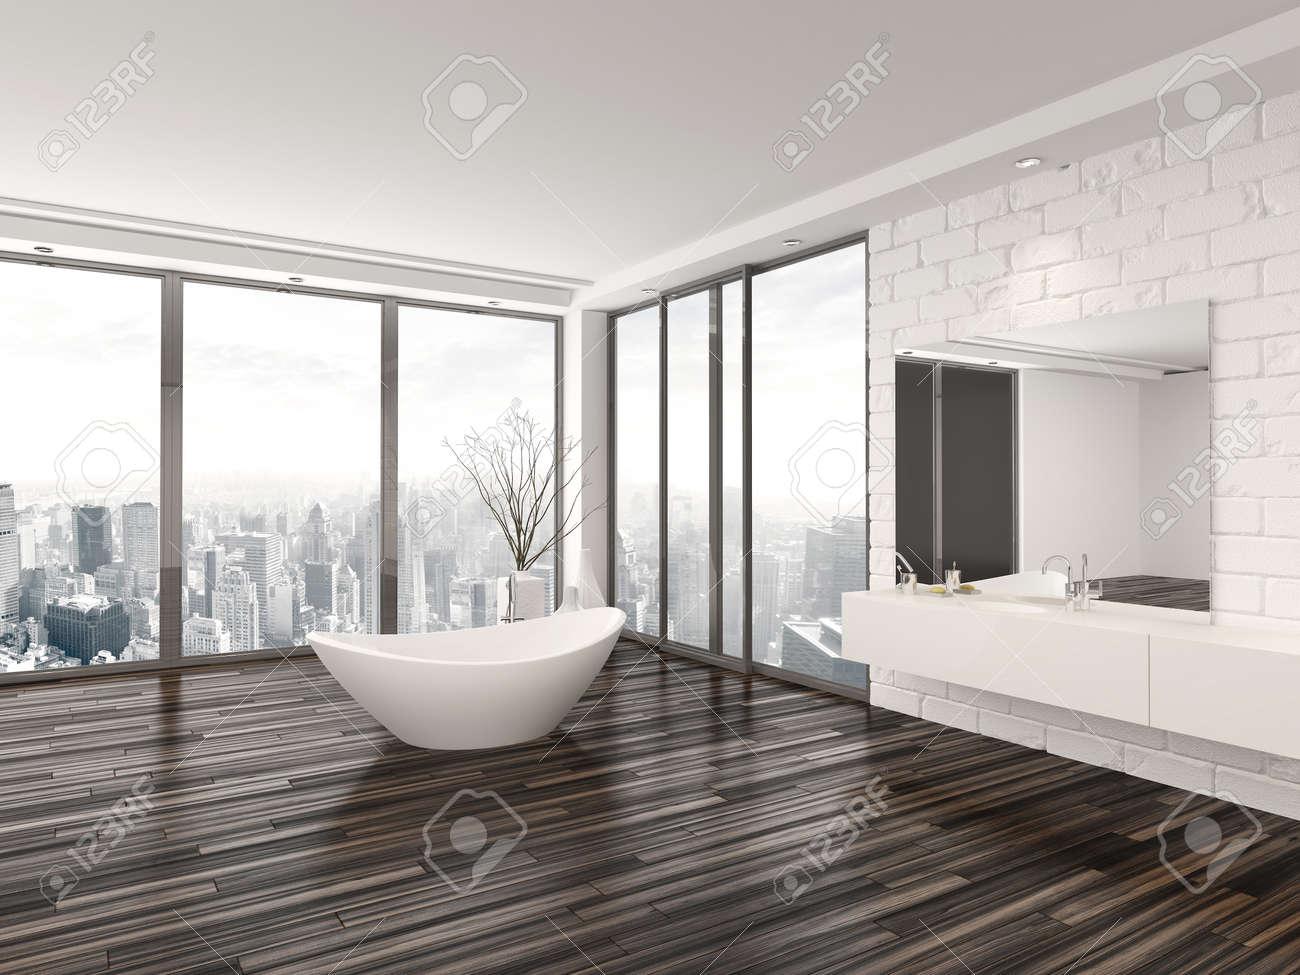 Modern White Minimalist Bathroom Interior With A Freestanding ...